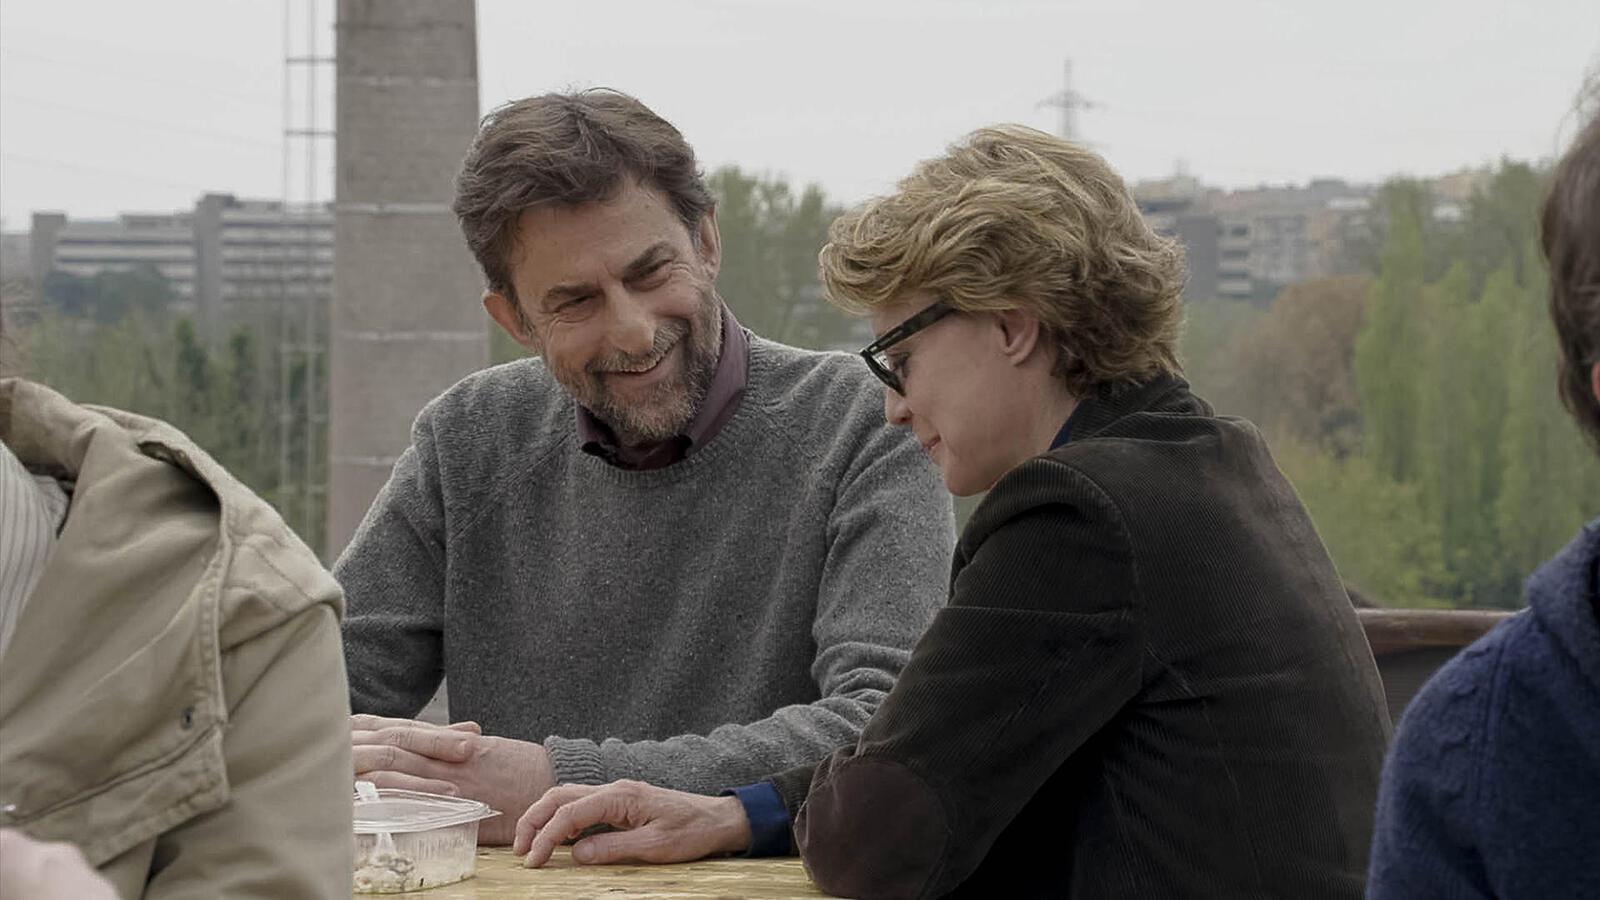 Nanni Moretti's Mia Madre is a contender for the Palme d'or at the Cannes Film Festival 2015